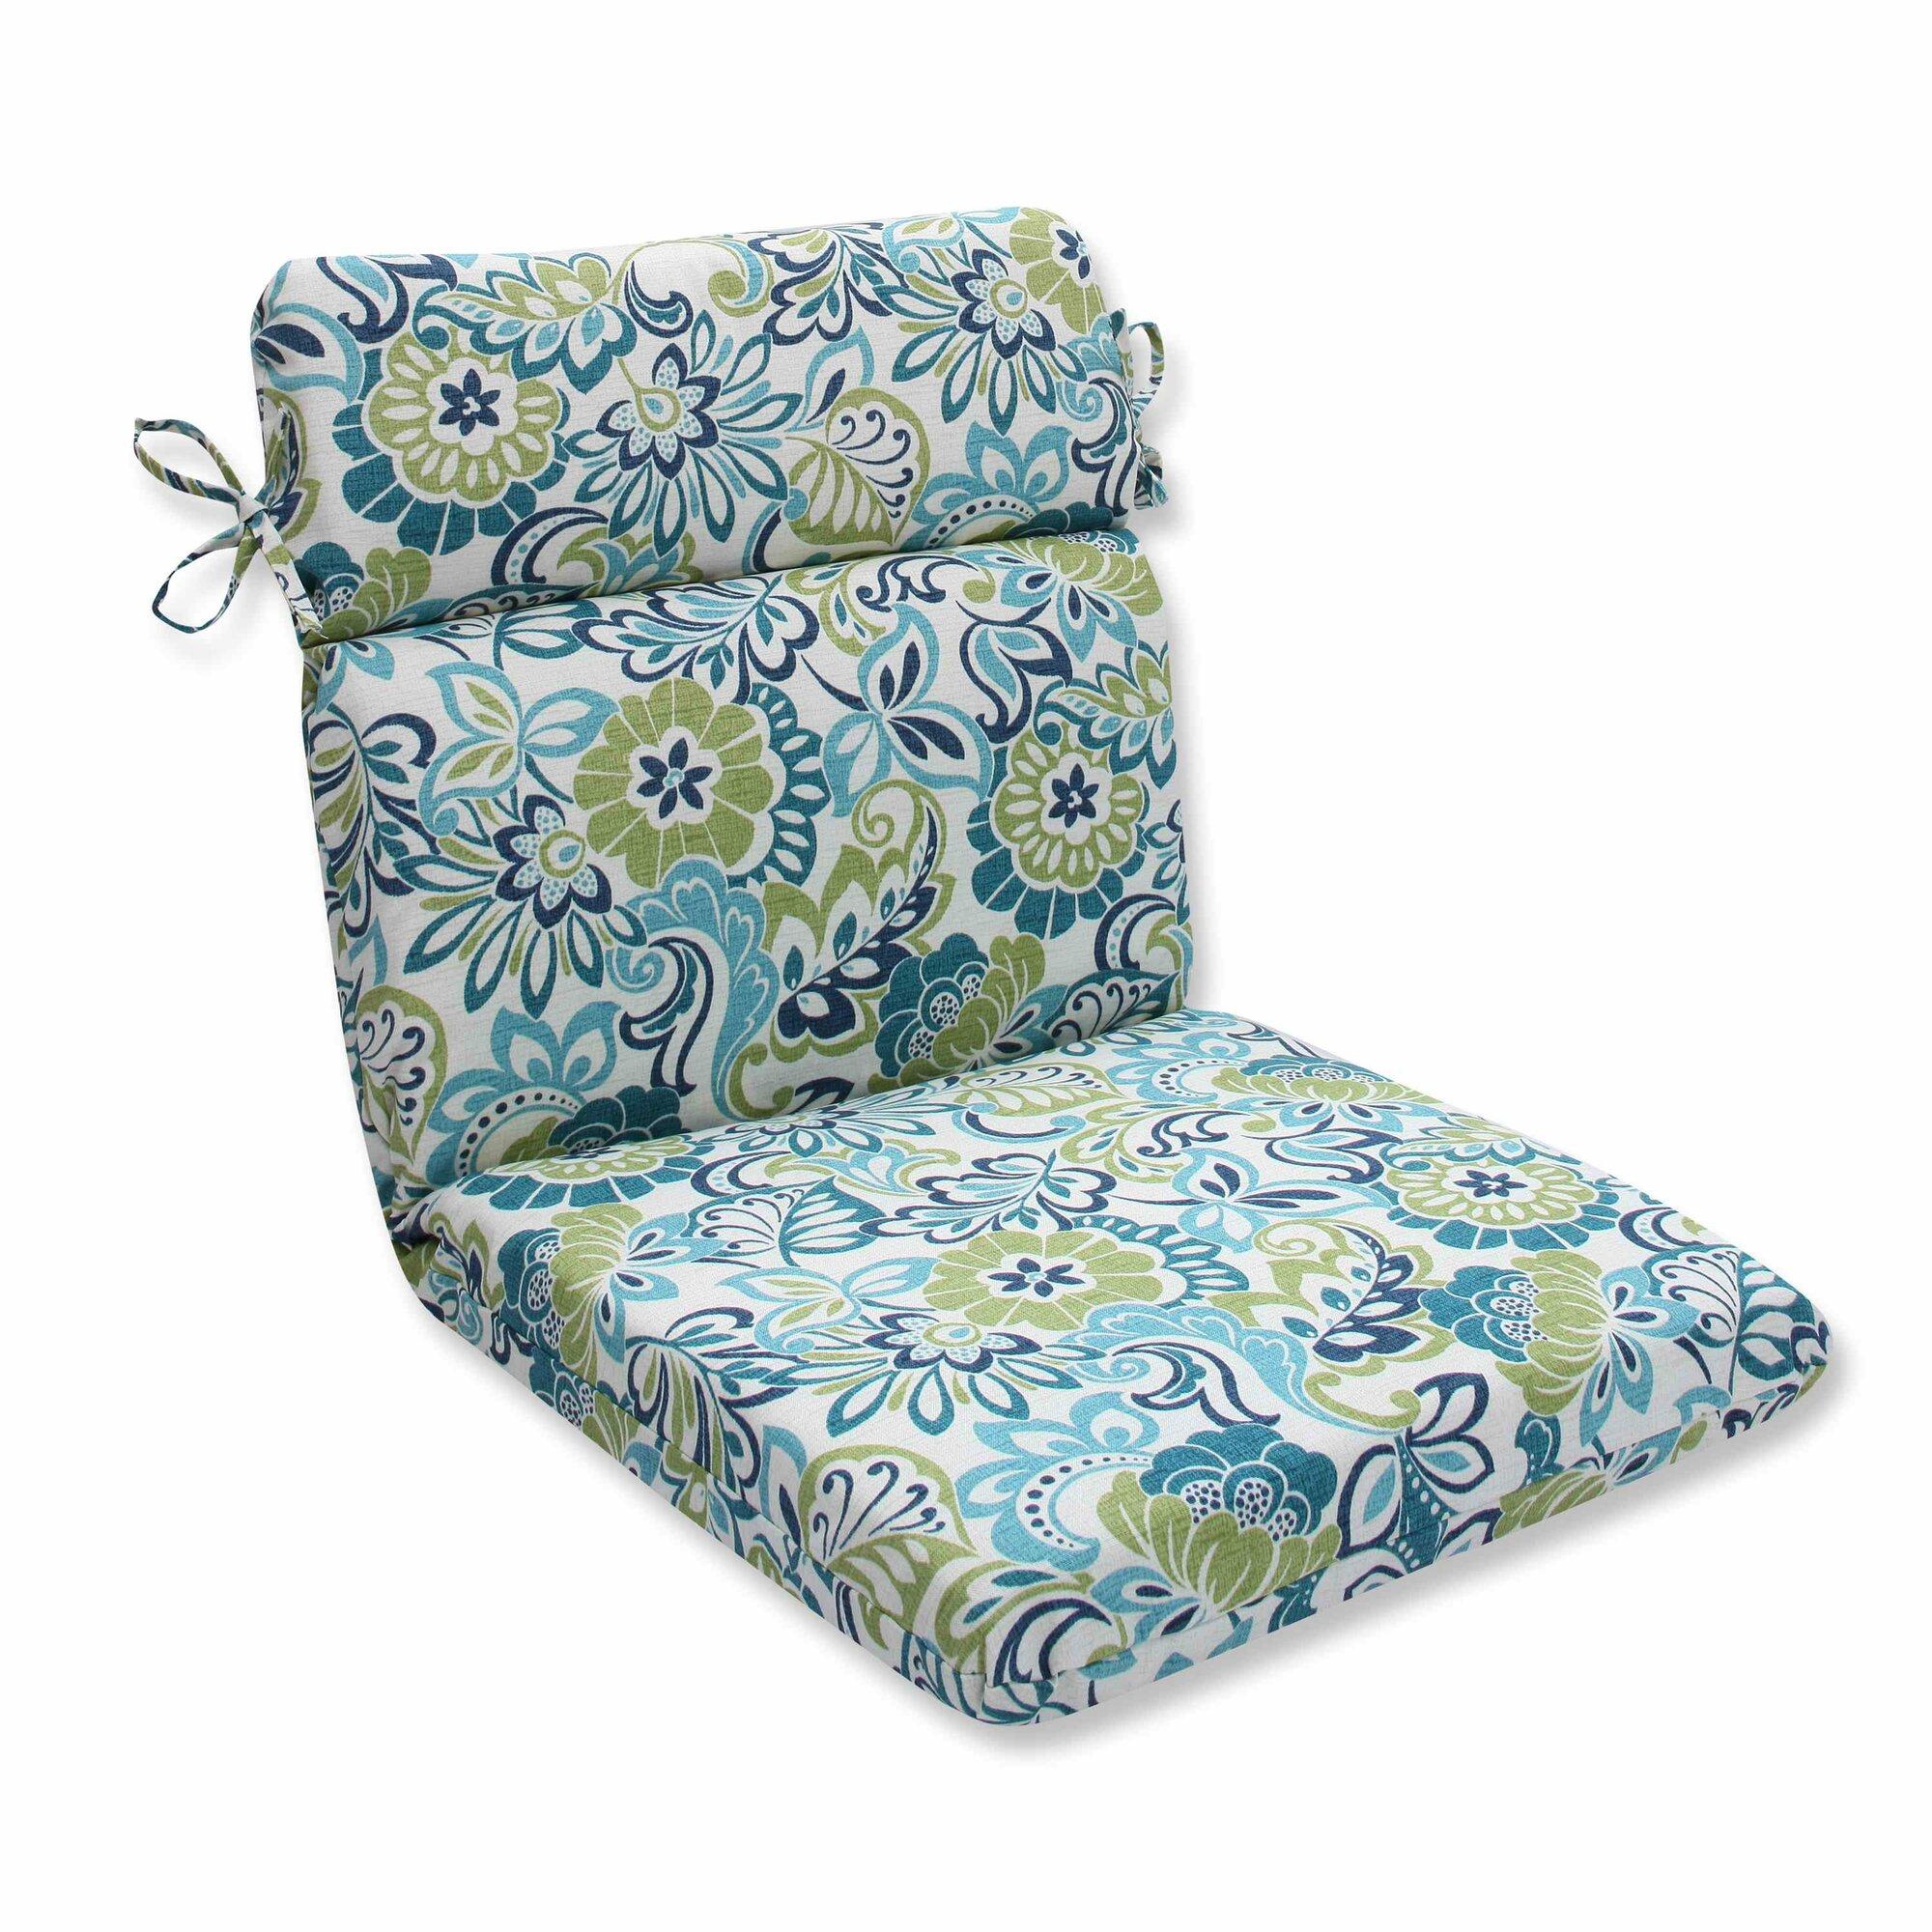 Winston Porter Indoor Outdoor Lounge Chair Cushion 192012337103 Ebay